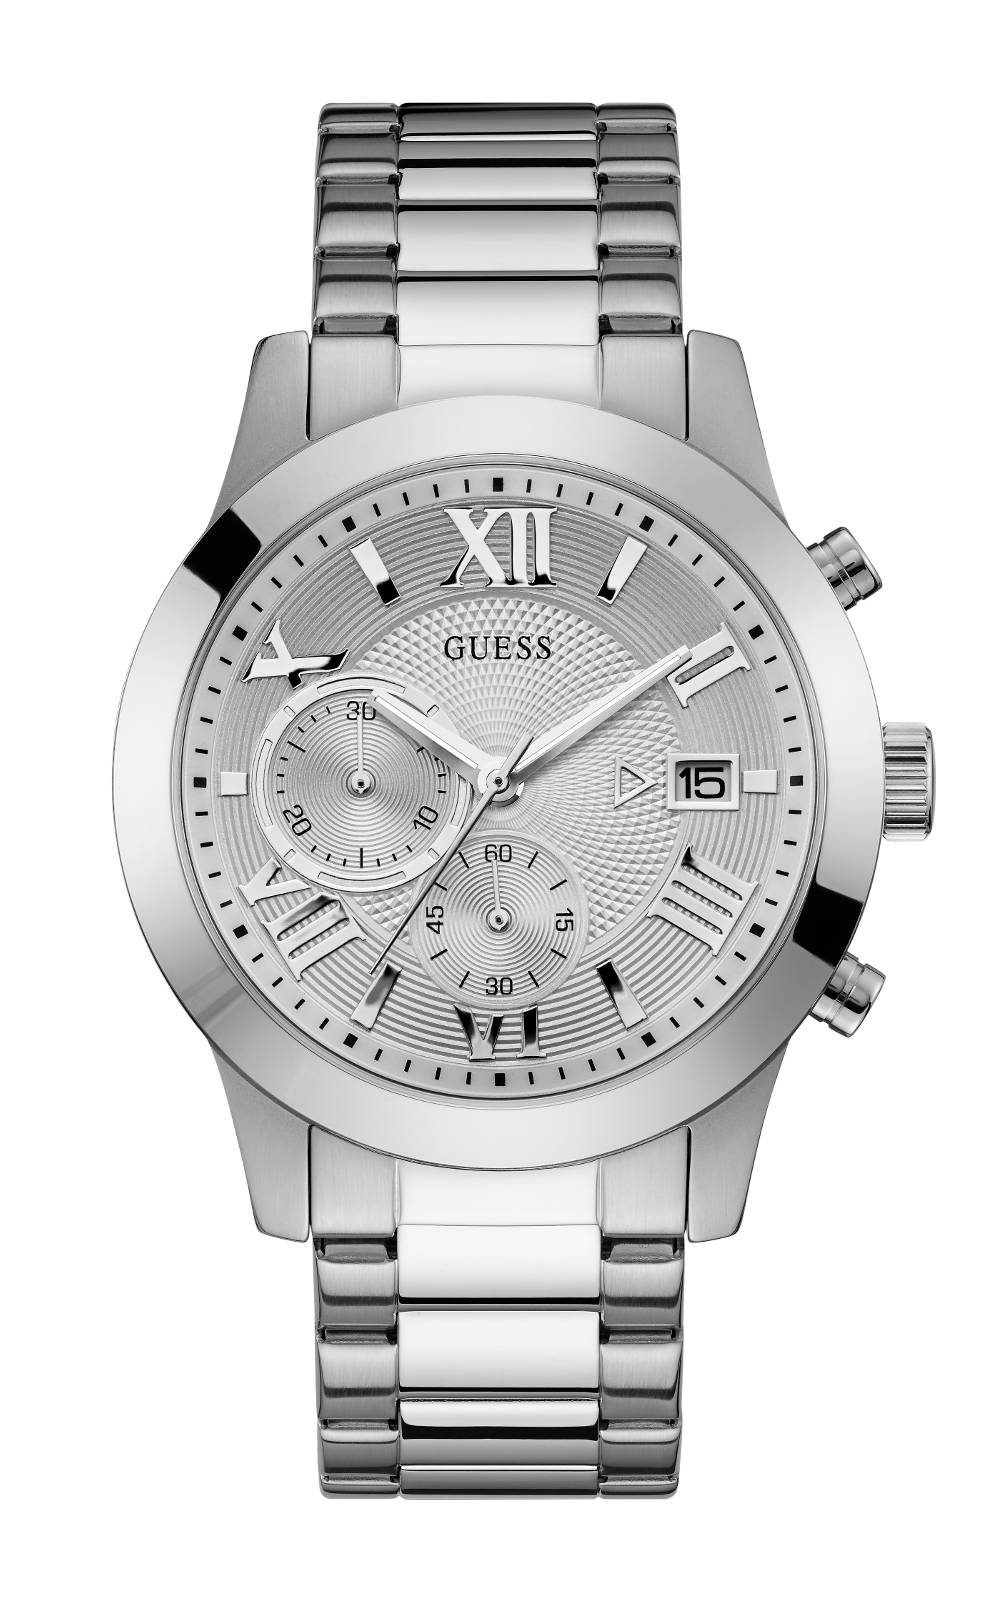 GUESS W0668G7 Ανδρικό Ρολόι Quartz Χρονογράφος Ακριβείας 809fb88739d